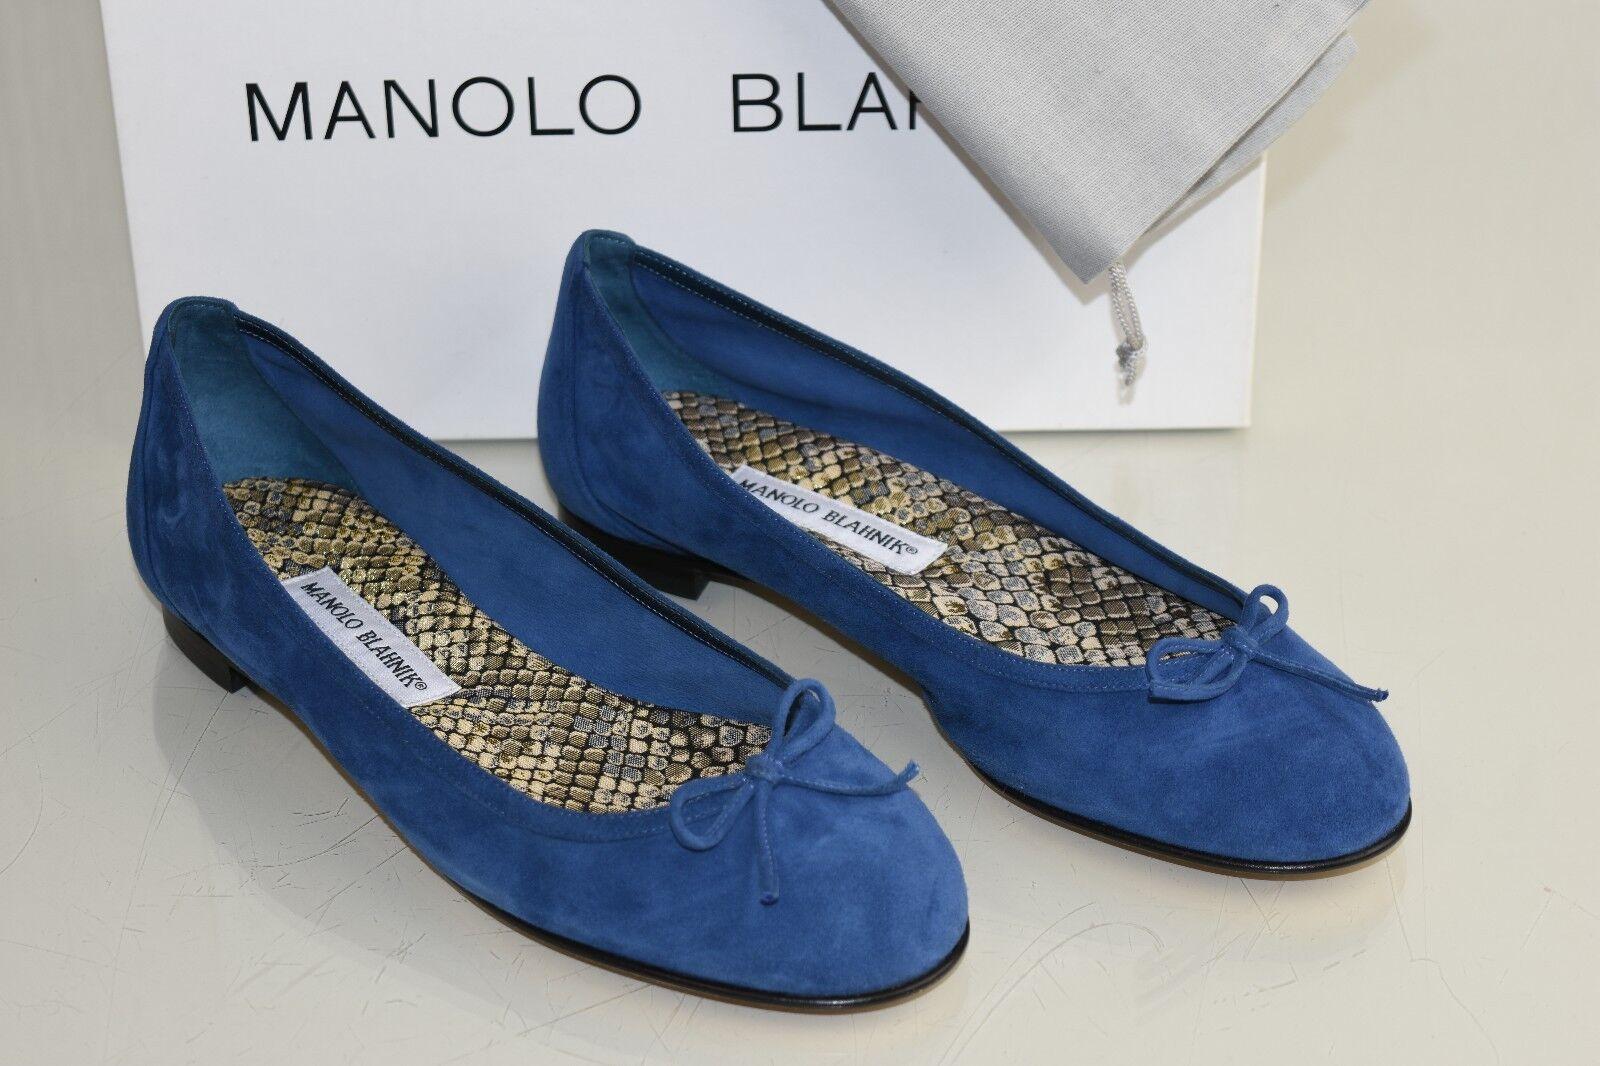 595 NEW Manolo Blahnik Blahnik Blahnik Fracto Suede Flats bluee Navy Flat SHOES Bow 37.5 39.5 40 025333